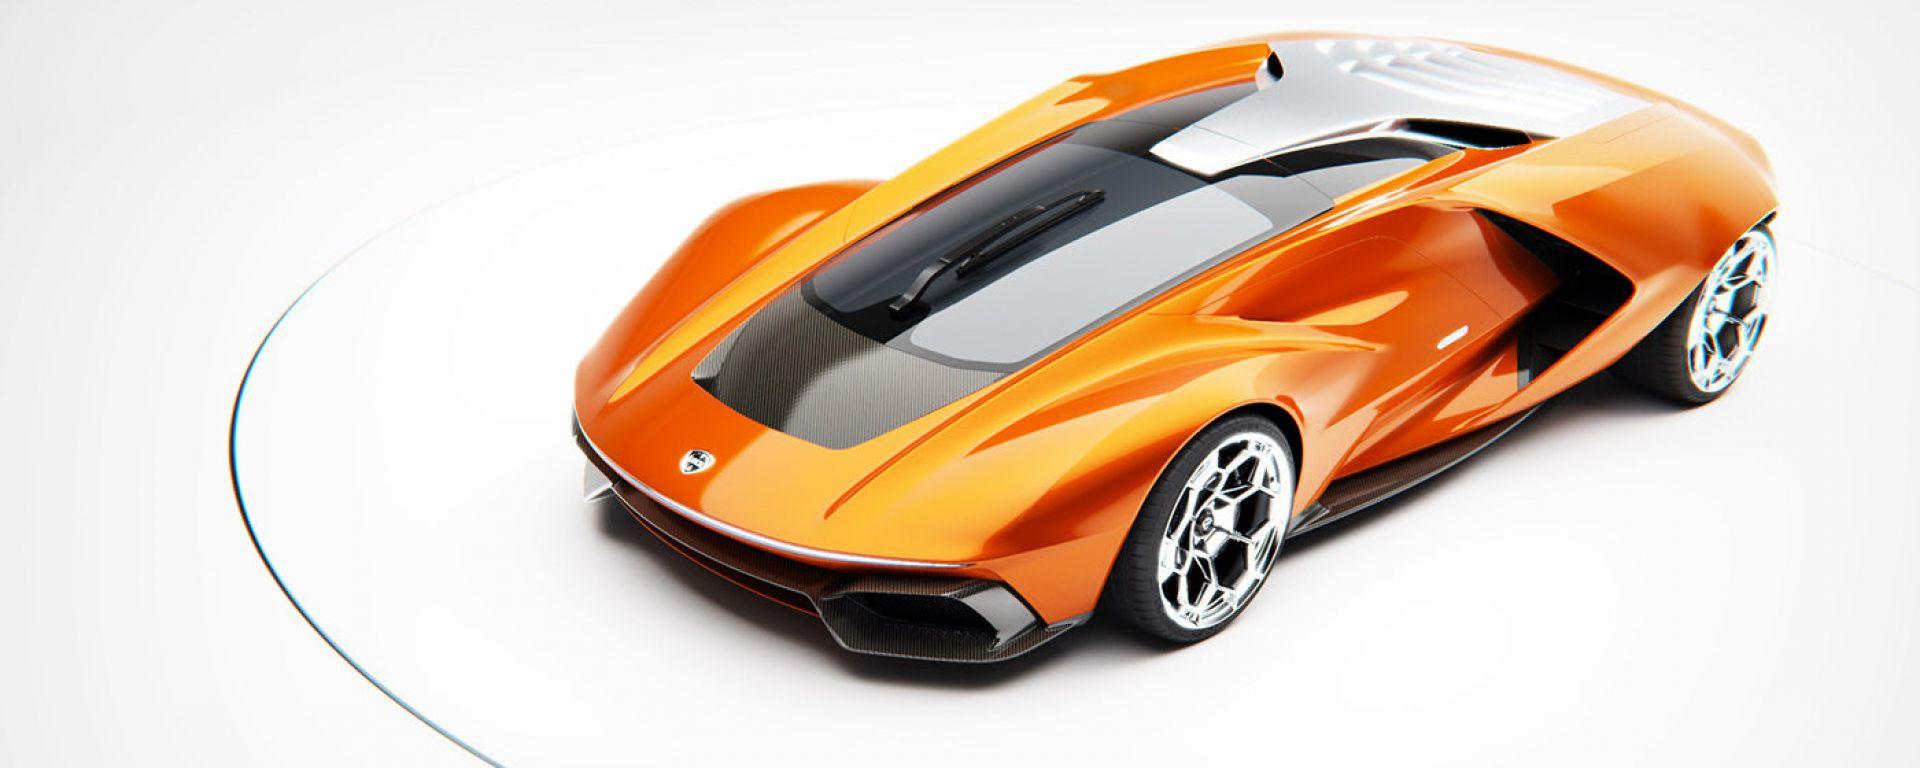 Lancia Stratos Zero rivisitata da Gentile di Touring Superleggera